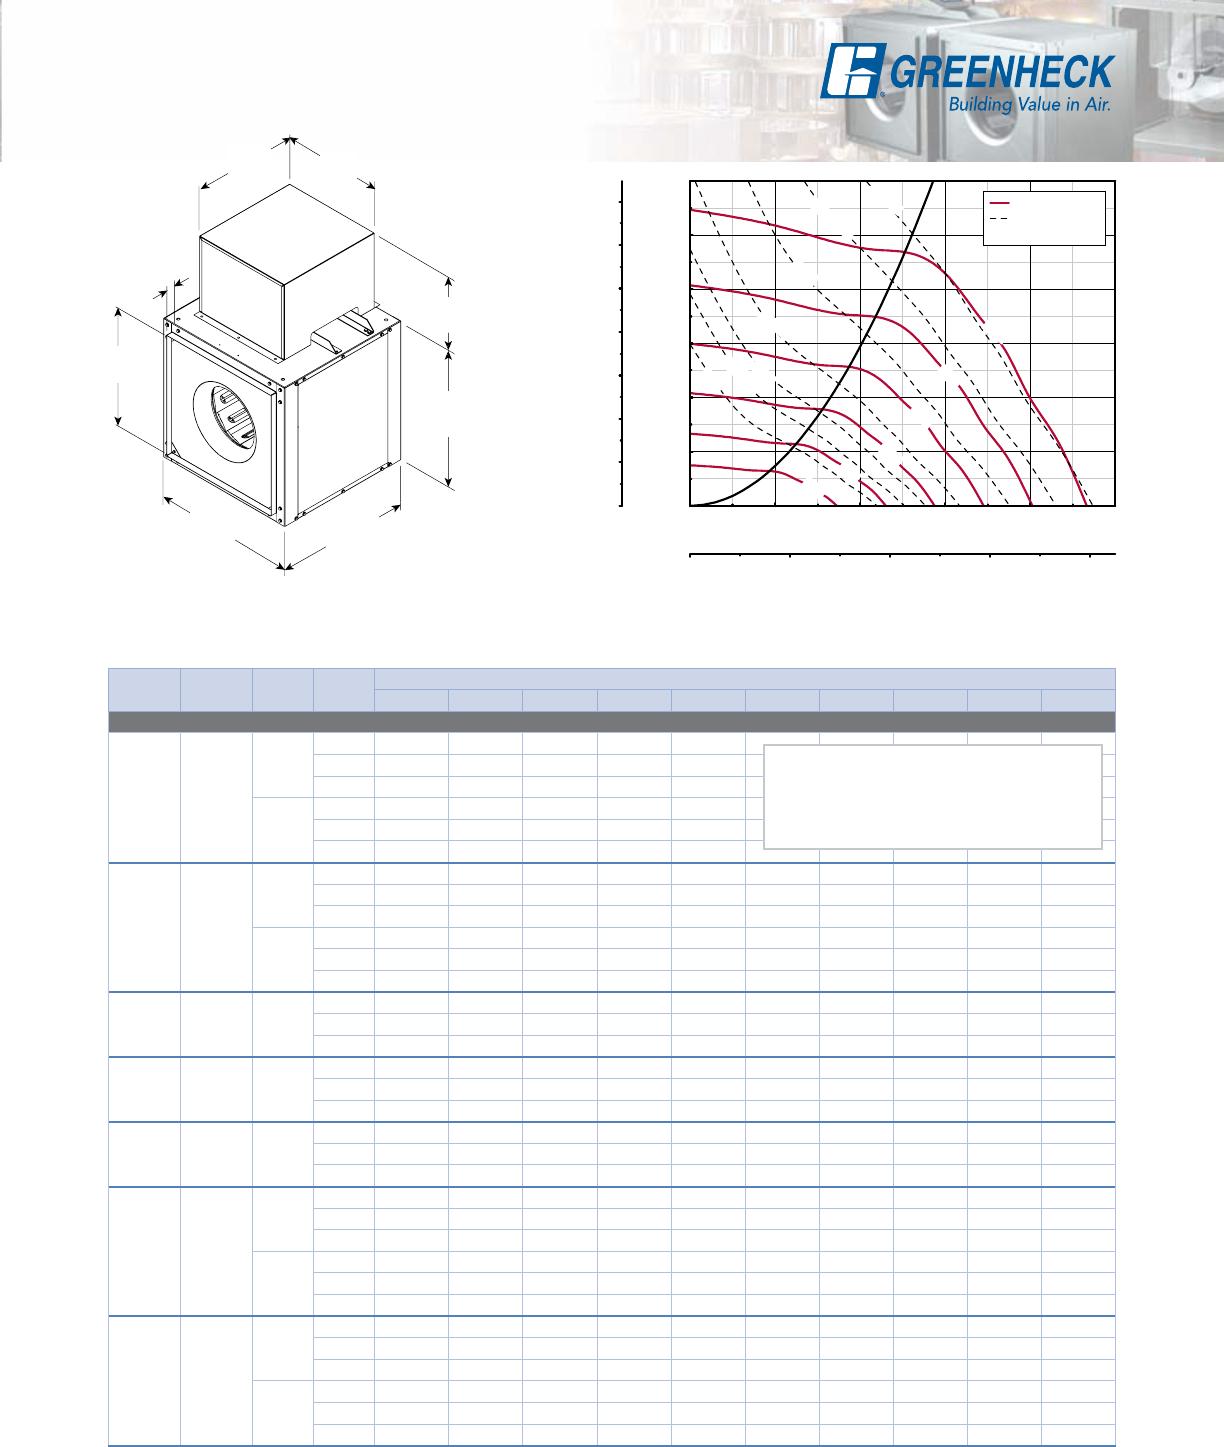 Greenheck Fan Sq Bsq Bsq 360 Wiring Diagram For 150Cc GY6 Scooter Greenheck Wiring  Diagrams